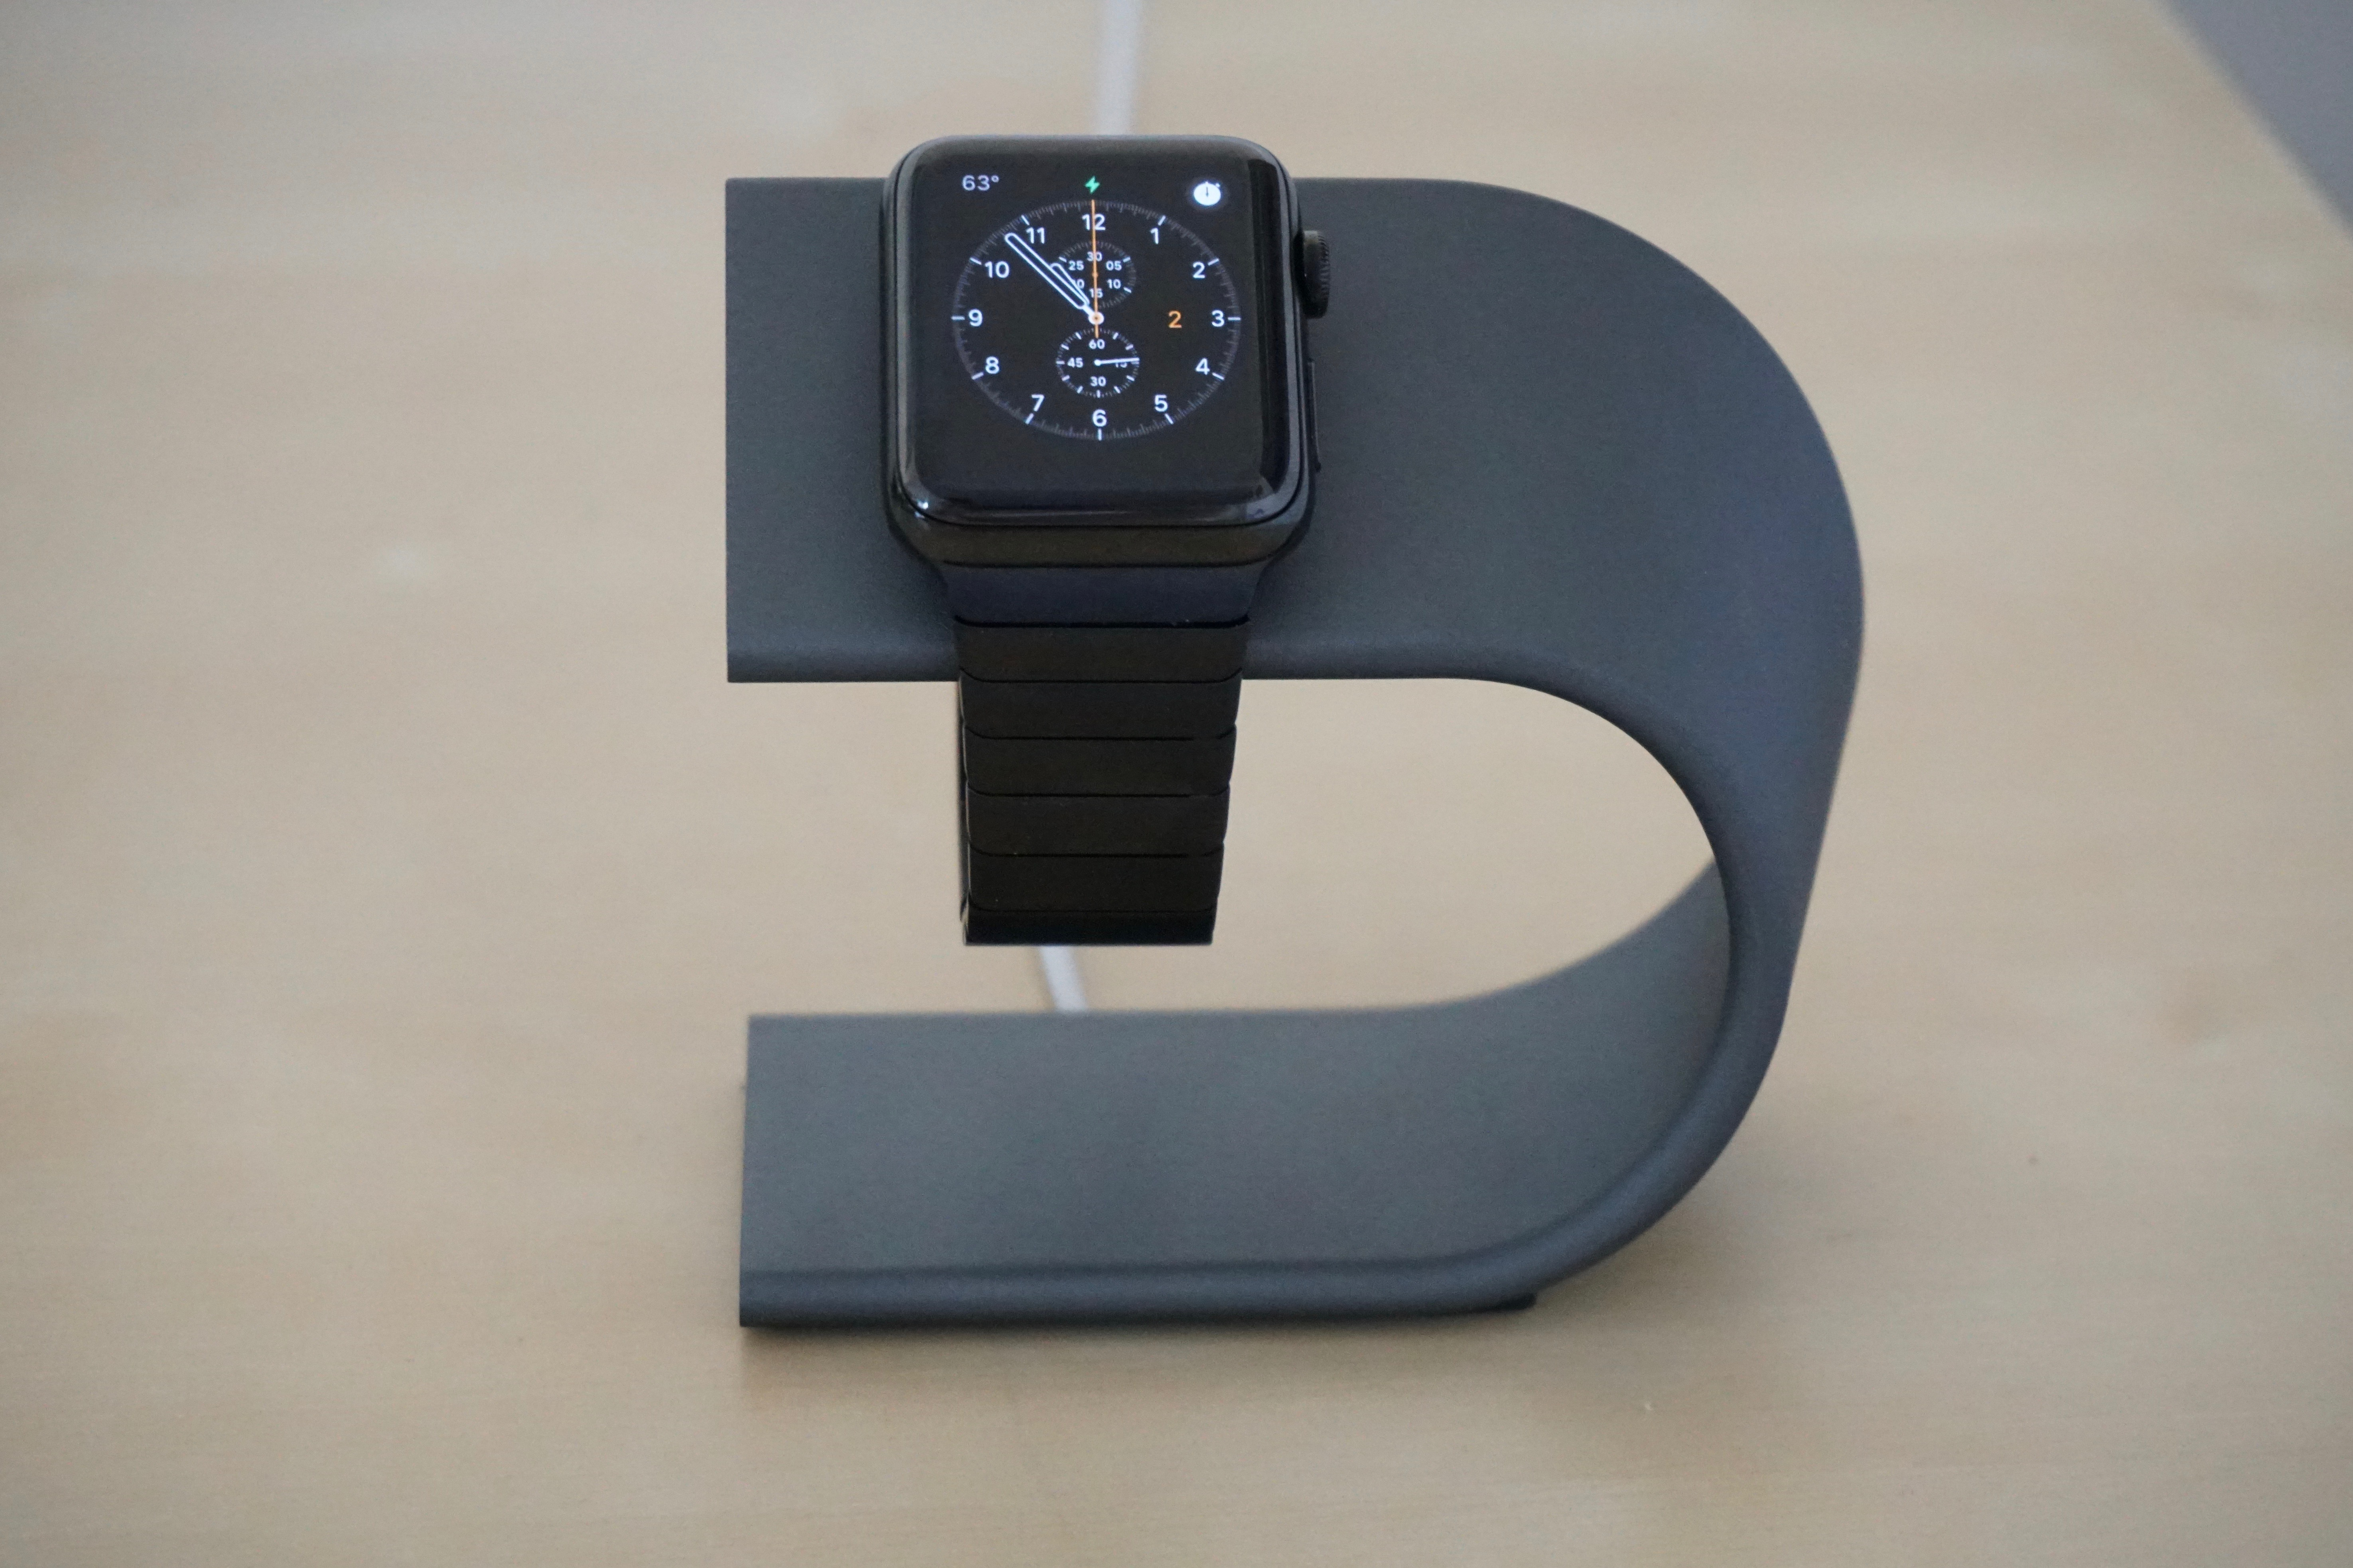 nomad-apple-watch-dock-4